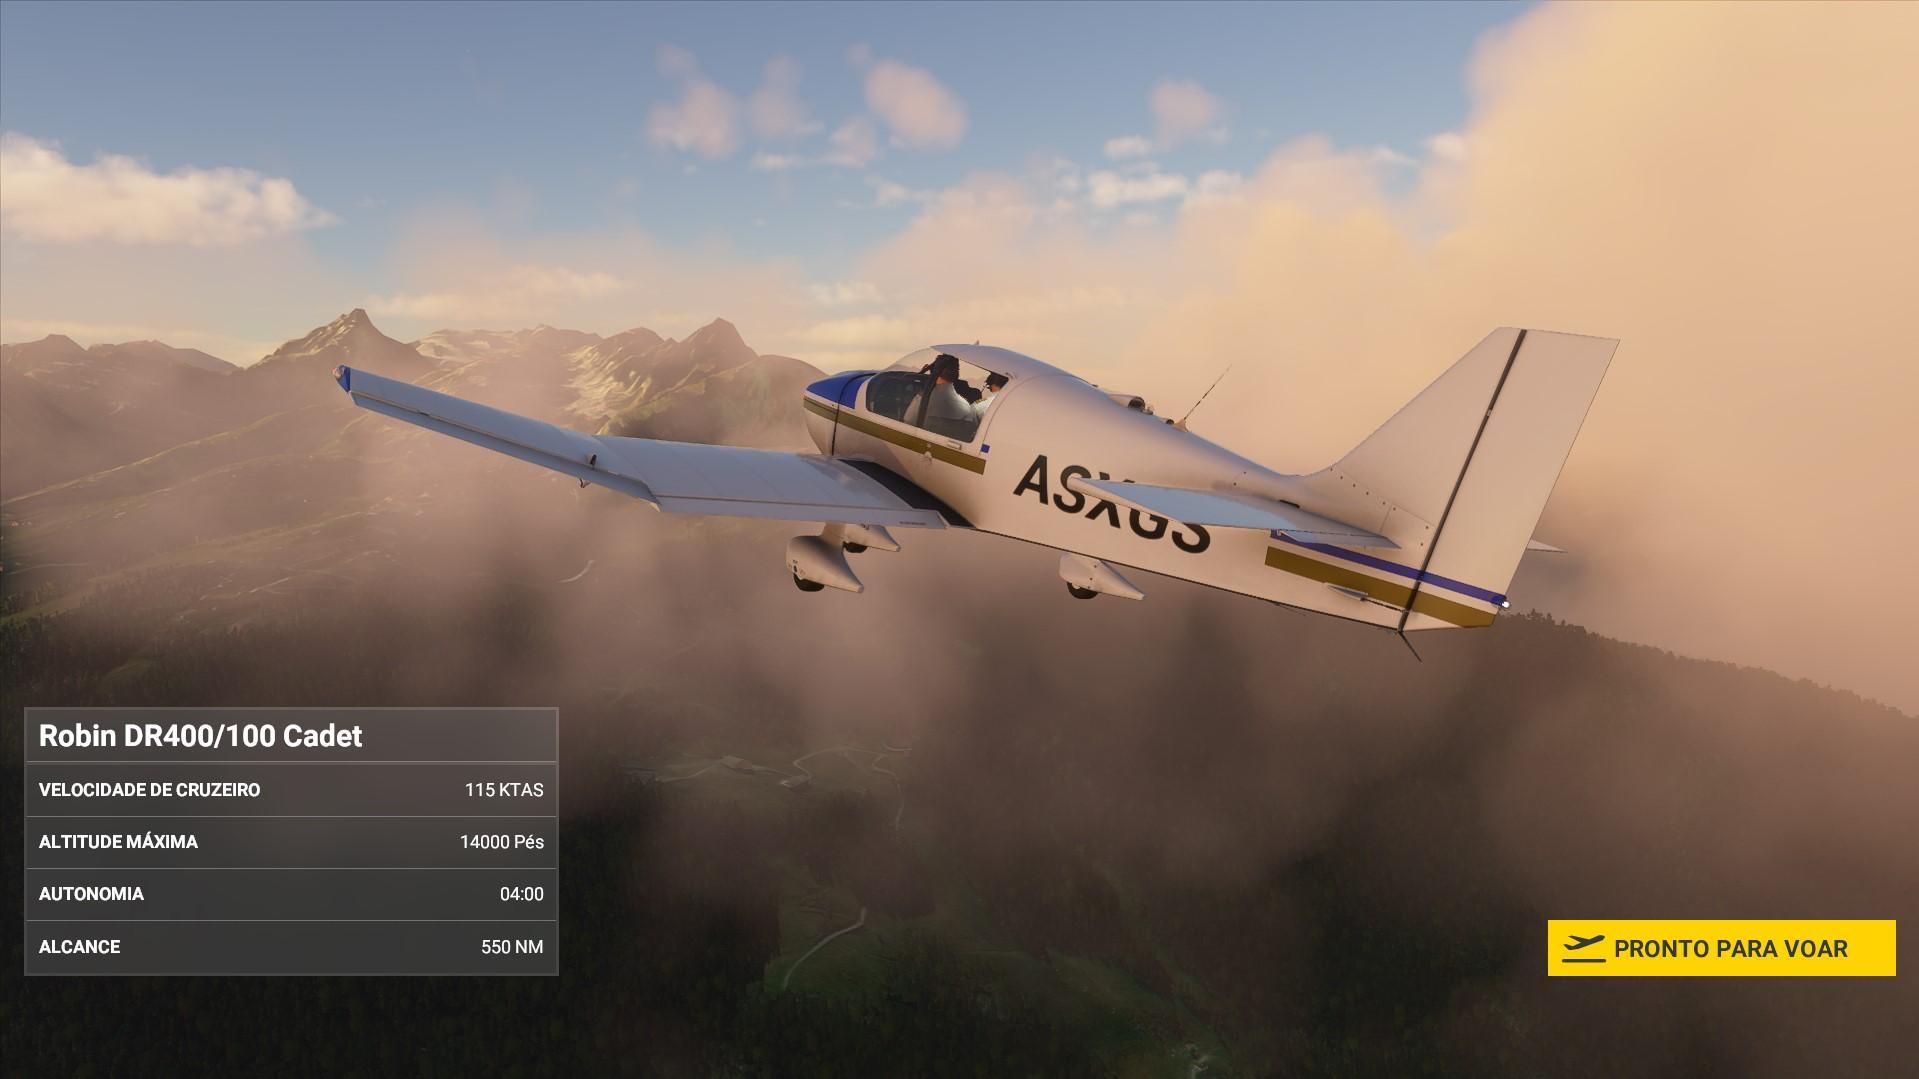 Courchevel - Robin DR400-100 Cadet - Flight Simulator